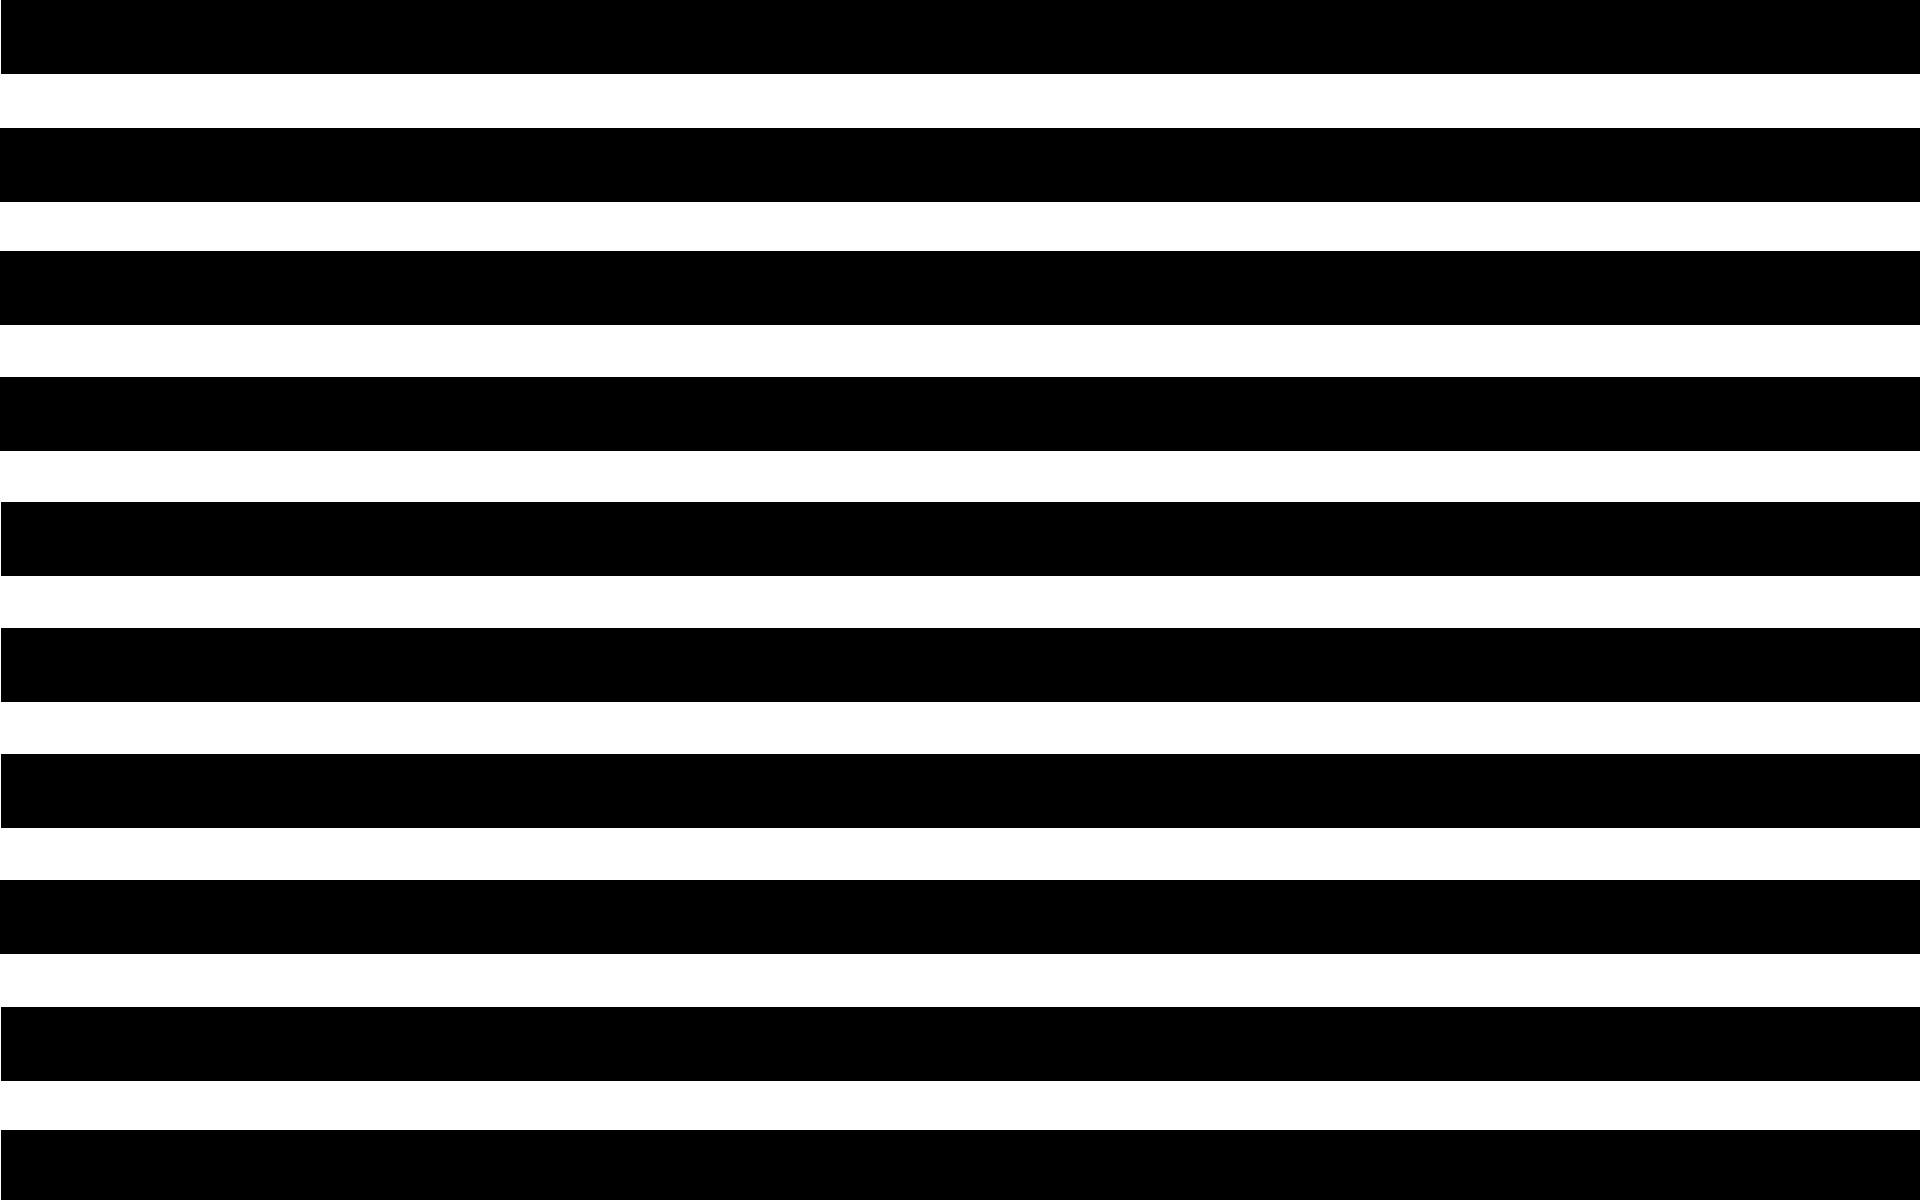 … Striped-Desktop-Wallpaper …